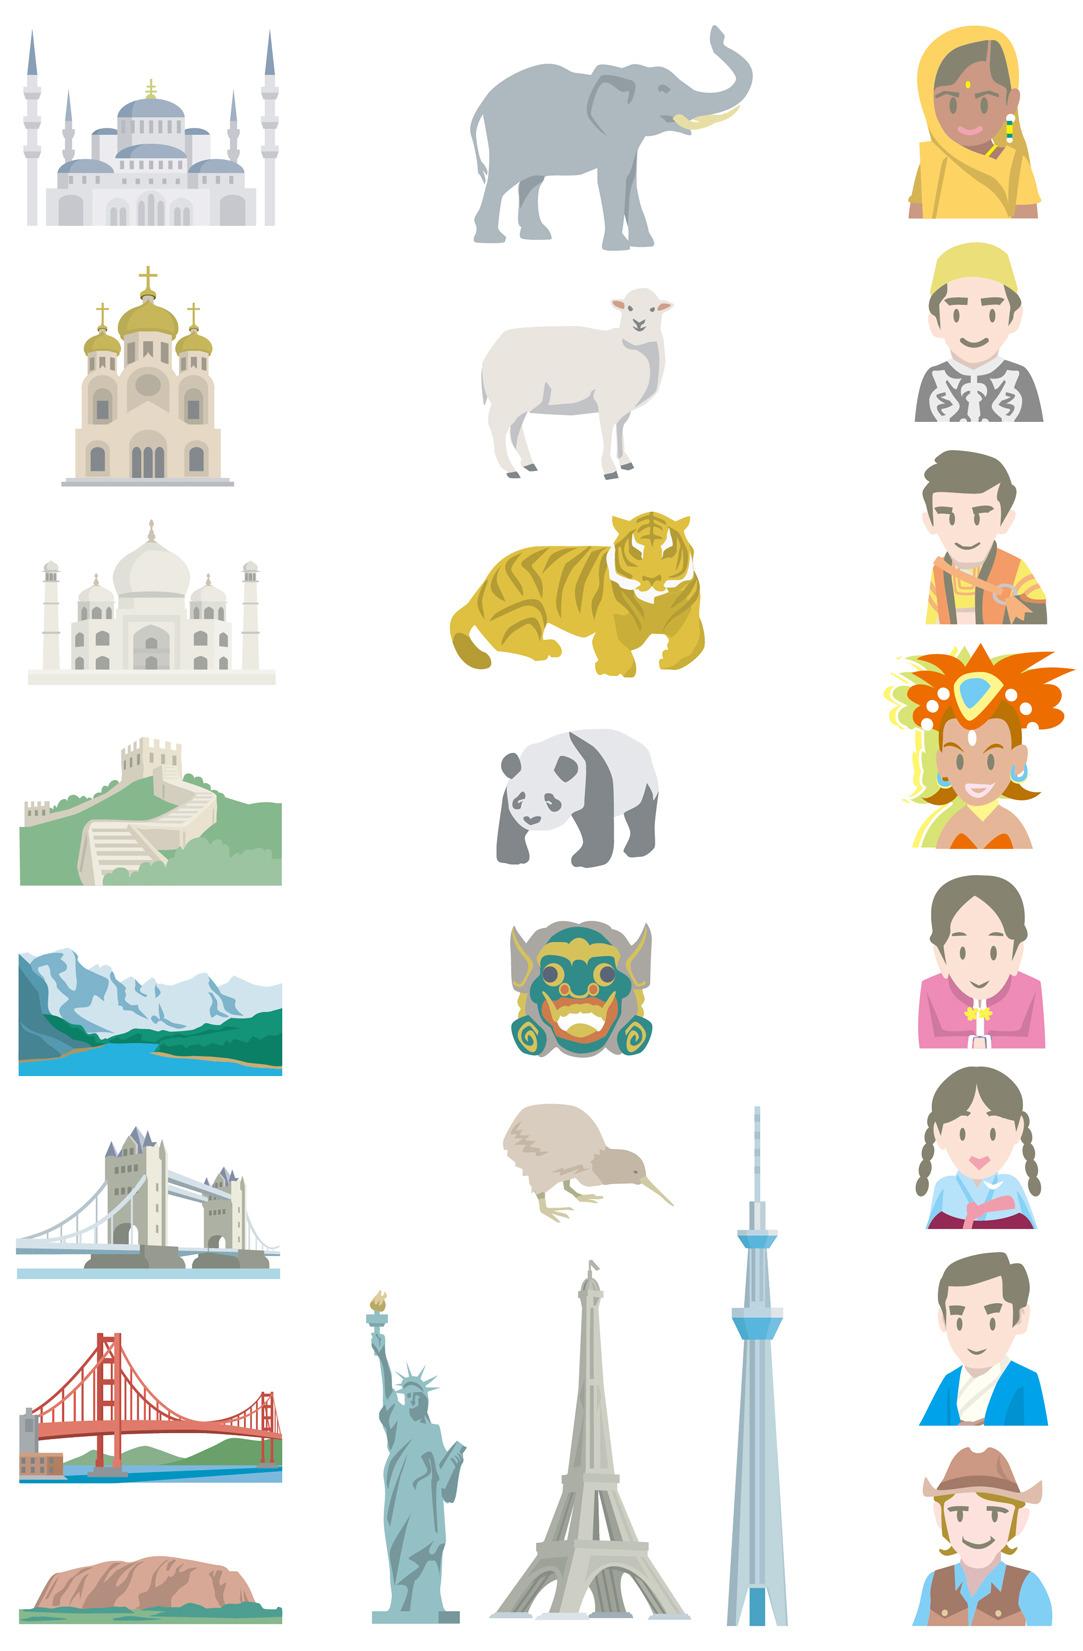 world_infographic_2017_1.jpg